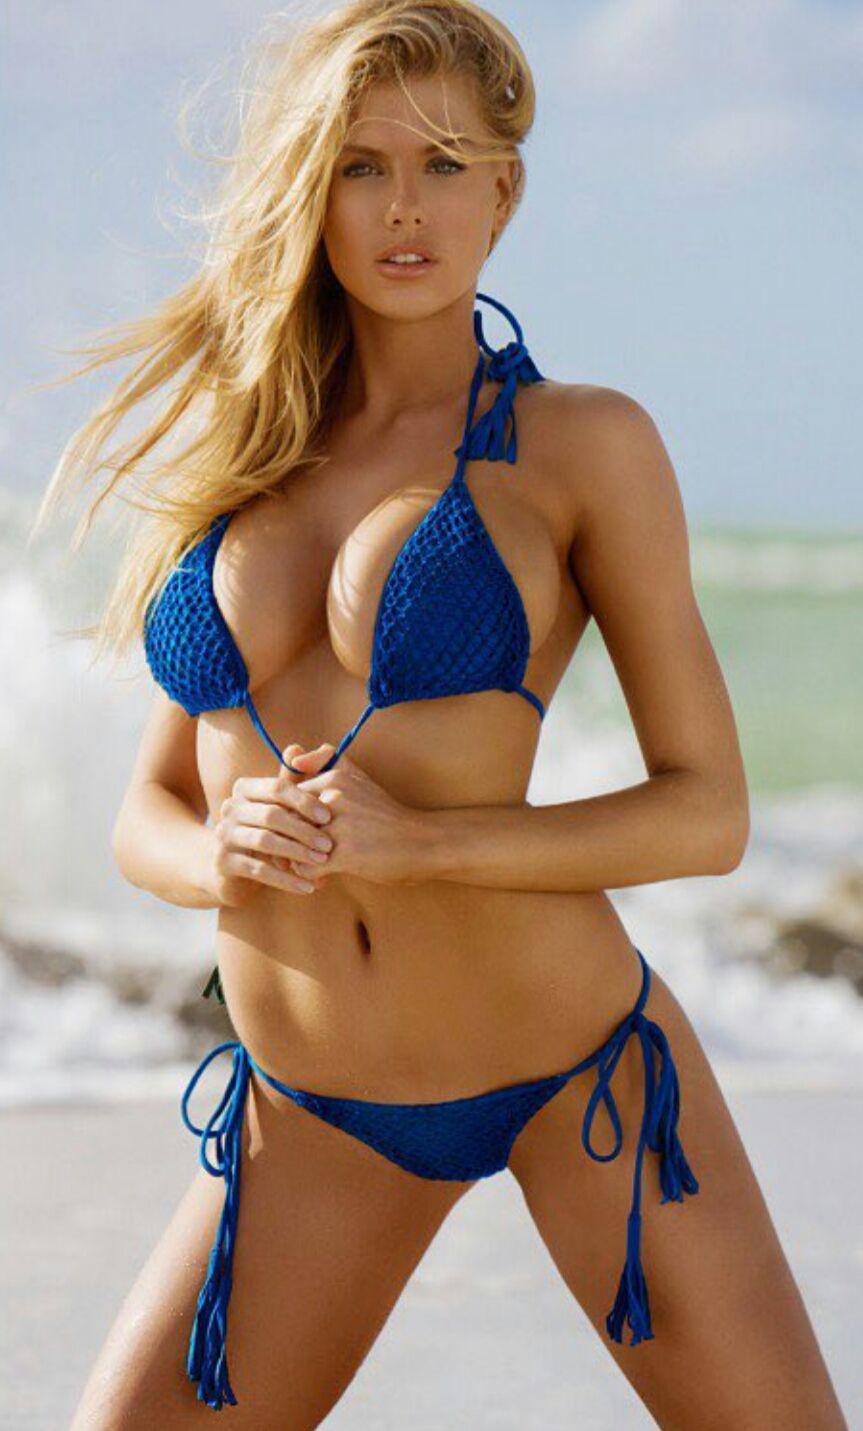 1d883ffc8abb4 Charlotte Mckinley  lmao  hot  babe  fashion  model  portrait  sexy  women   freetoedit